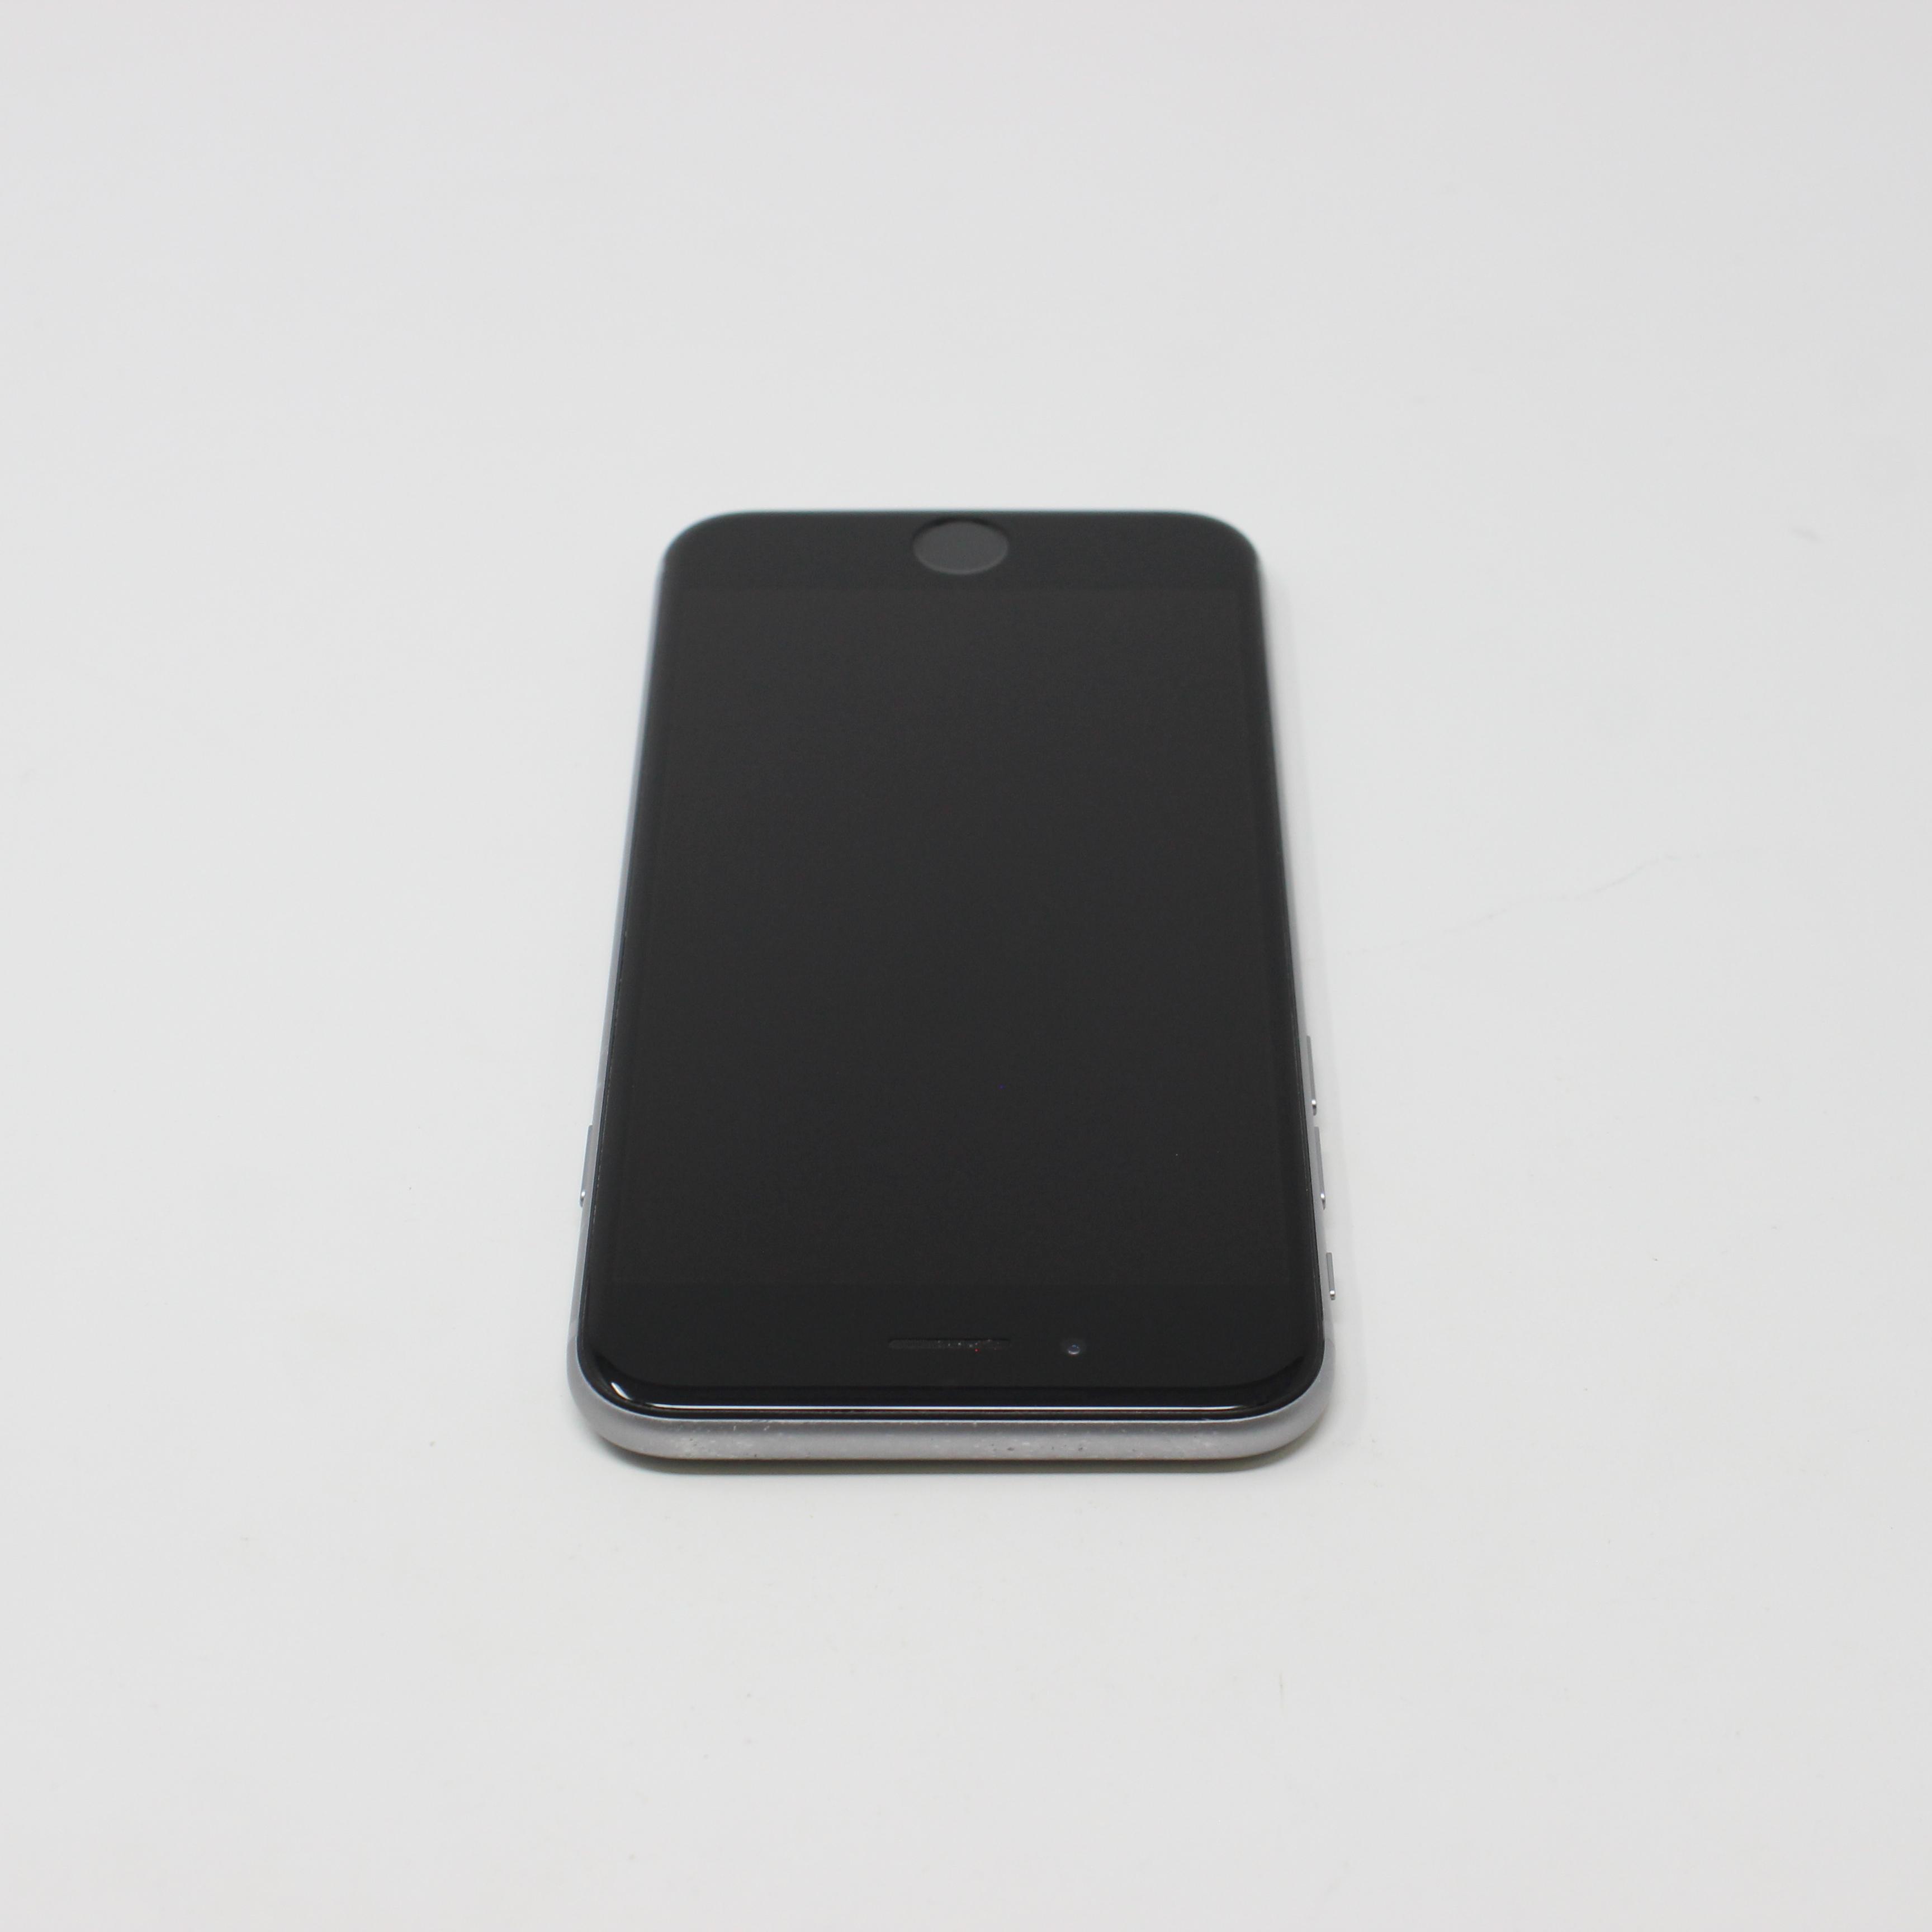 iPhone 6 64GB Space Gray - T-Mobile photo 4 | UpTradeit.com